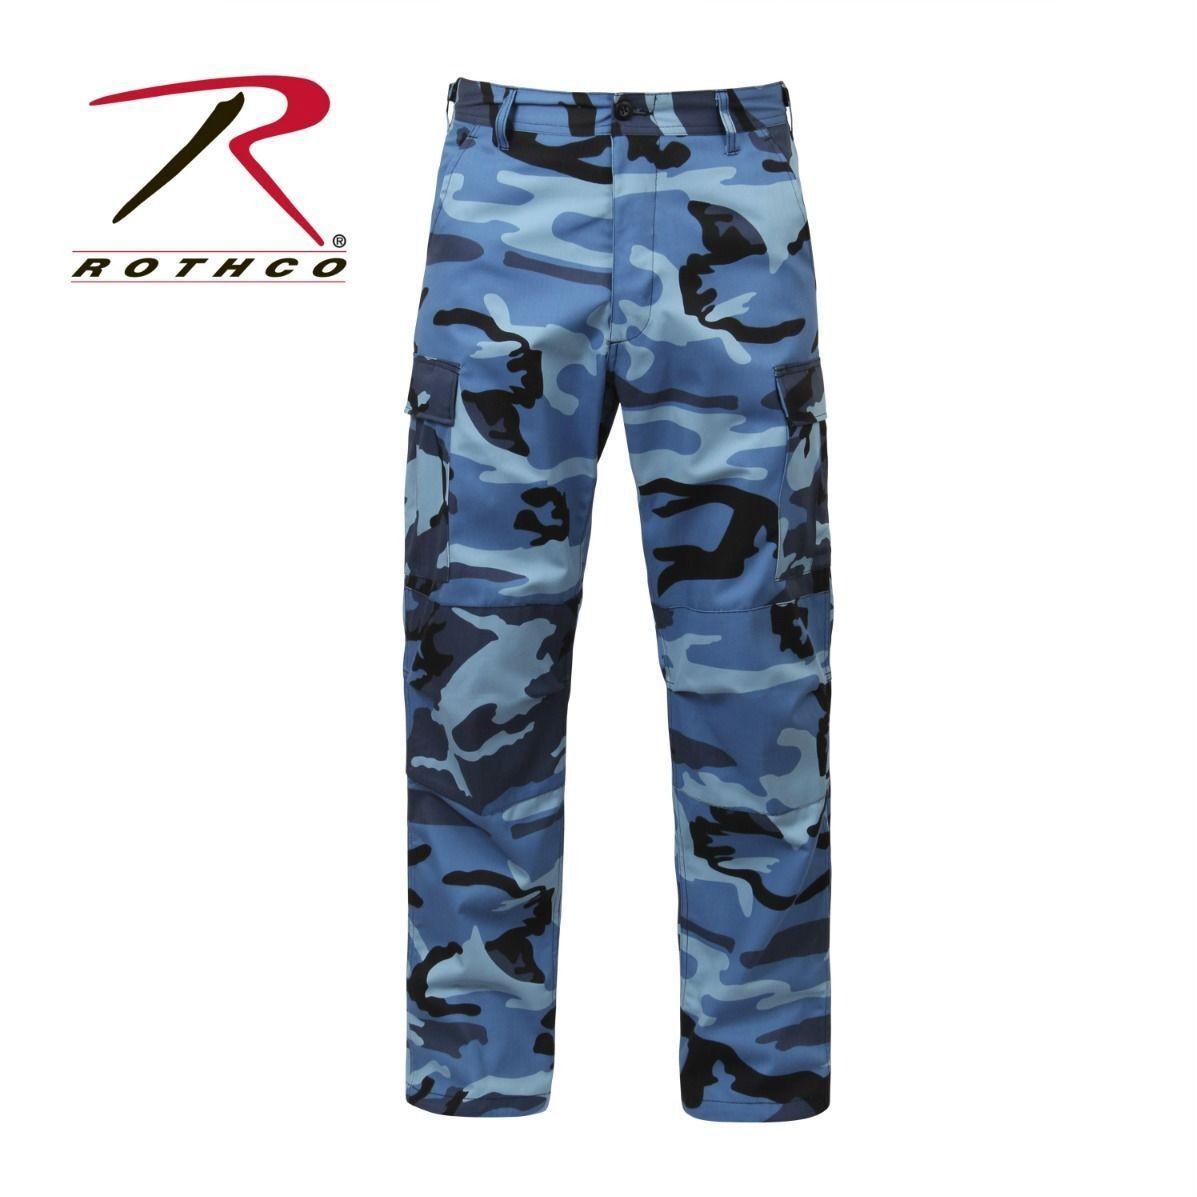 redhco 7882 New Sky bluee Camo Military Cargo Polyester Cotton Fatigue BDU Pants